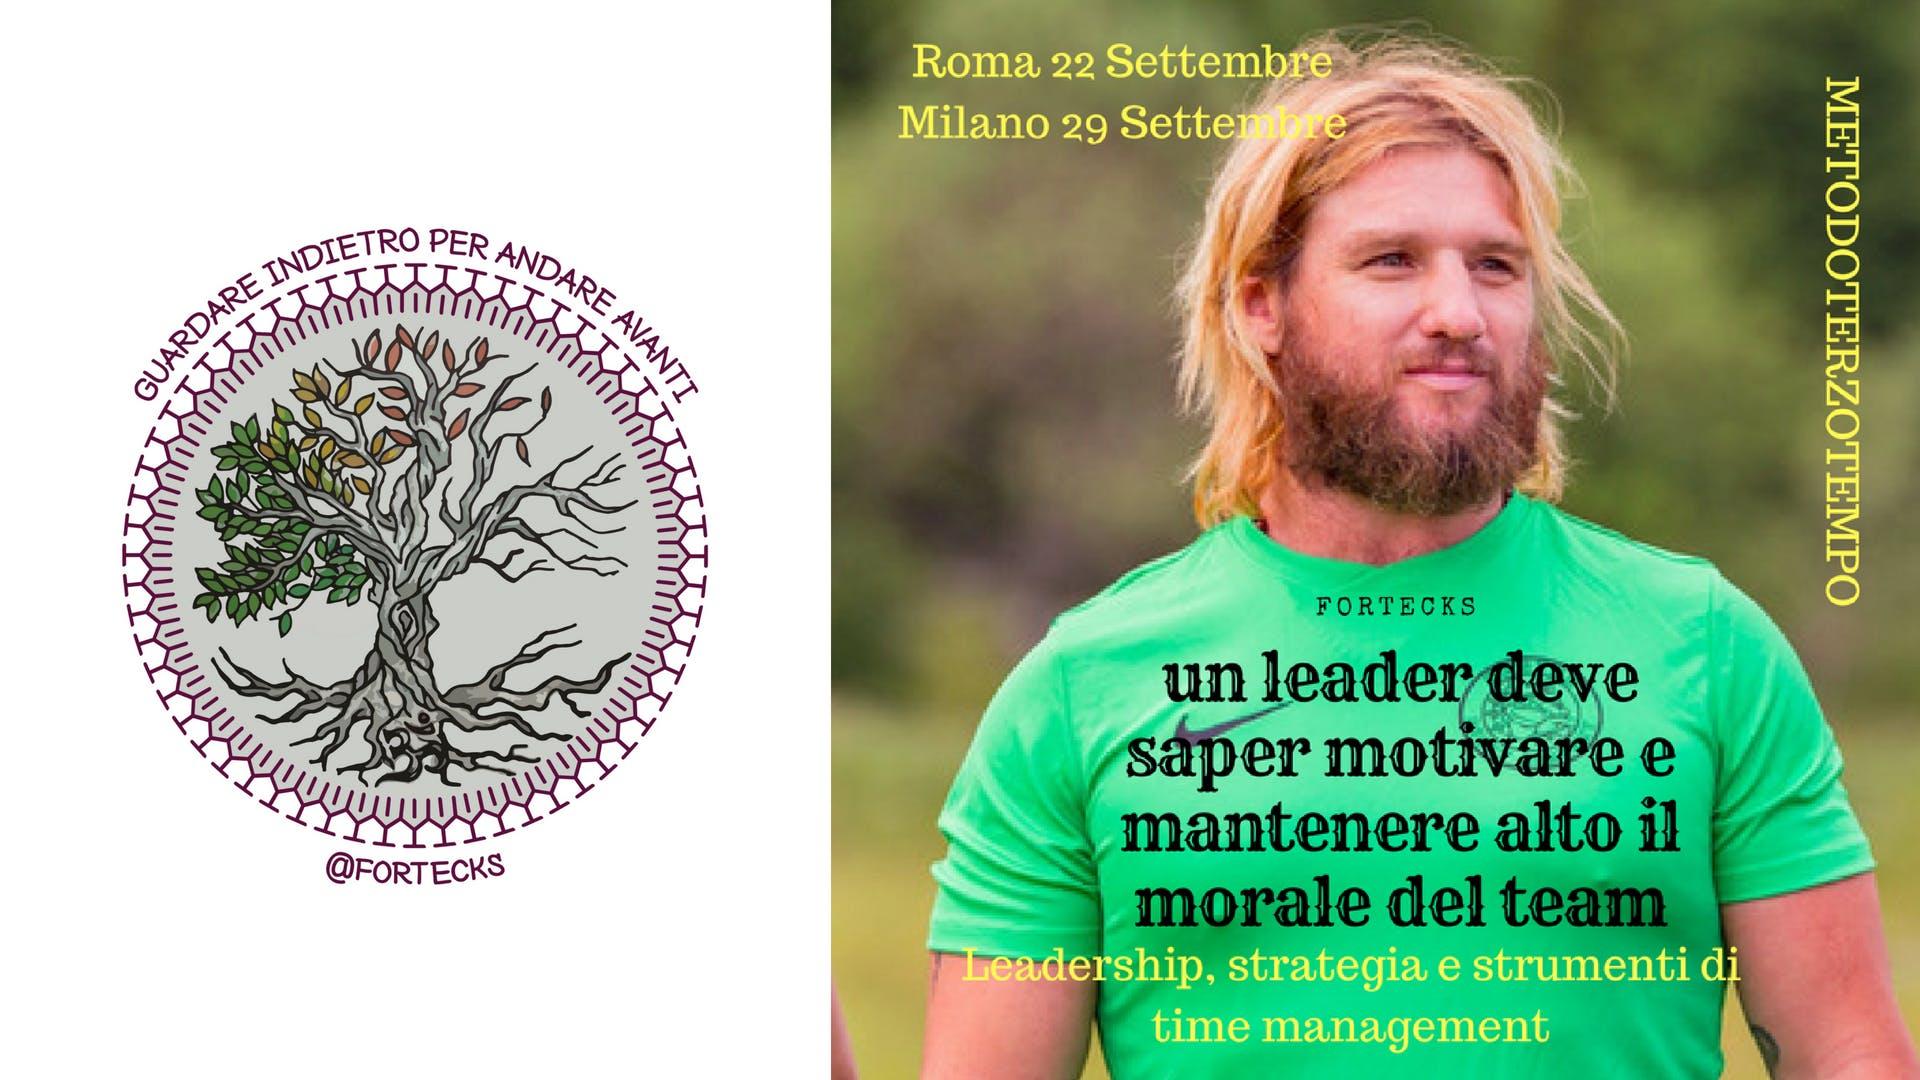 Leadership strategia e strumenti di time mana